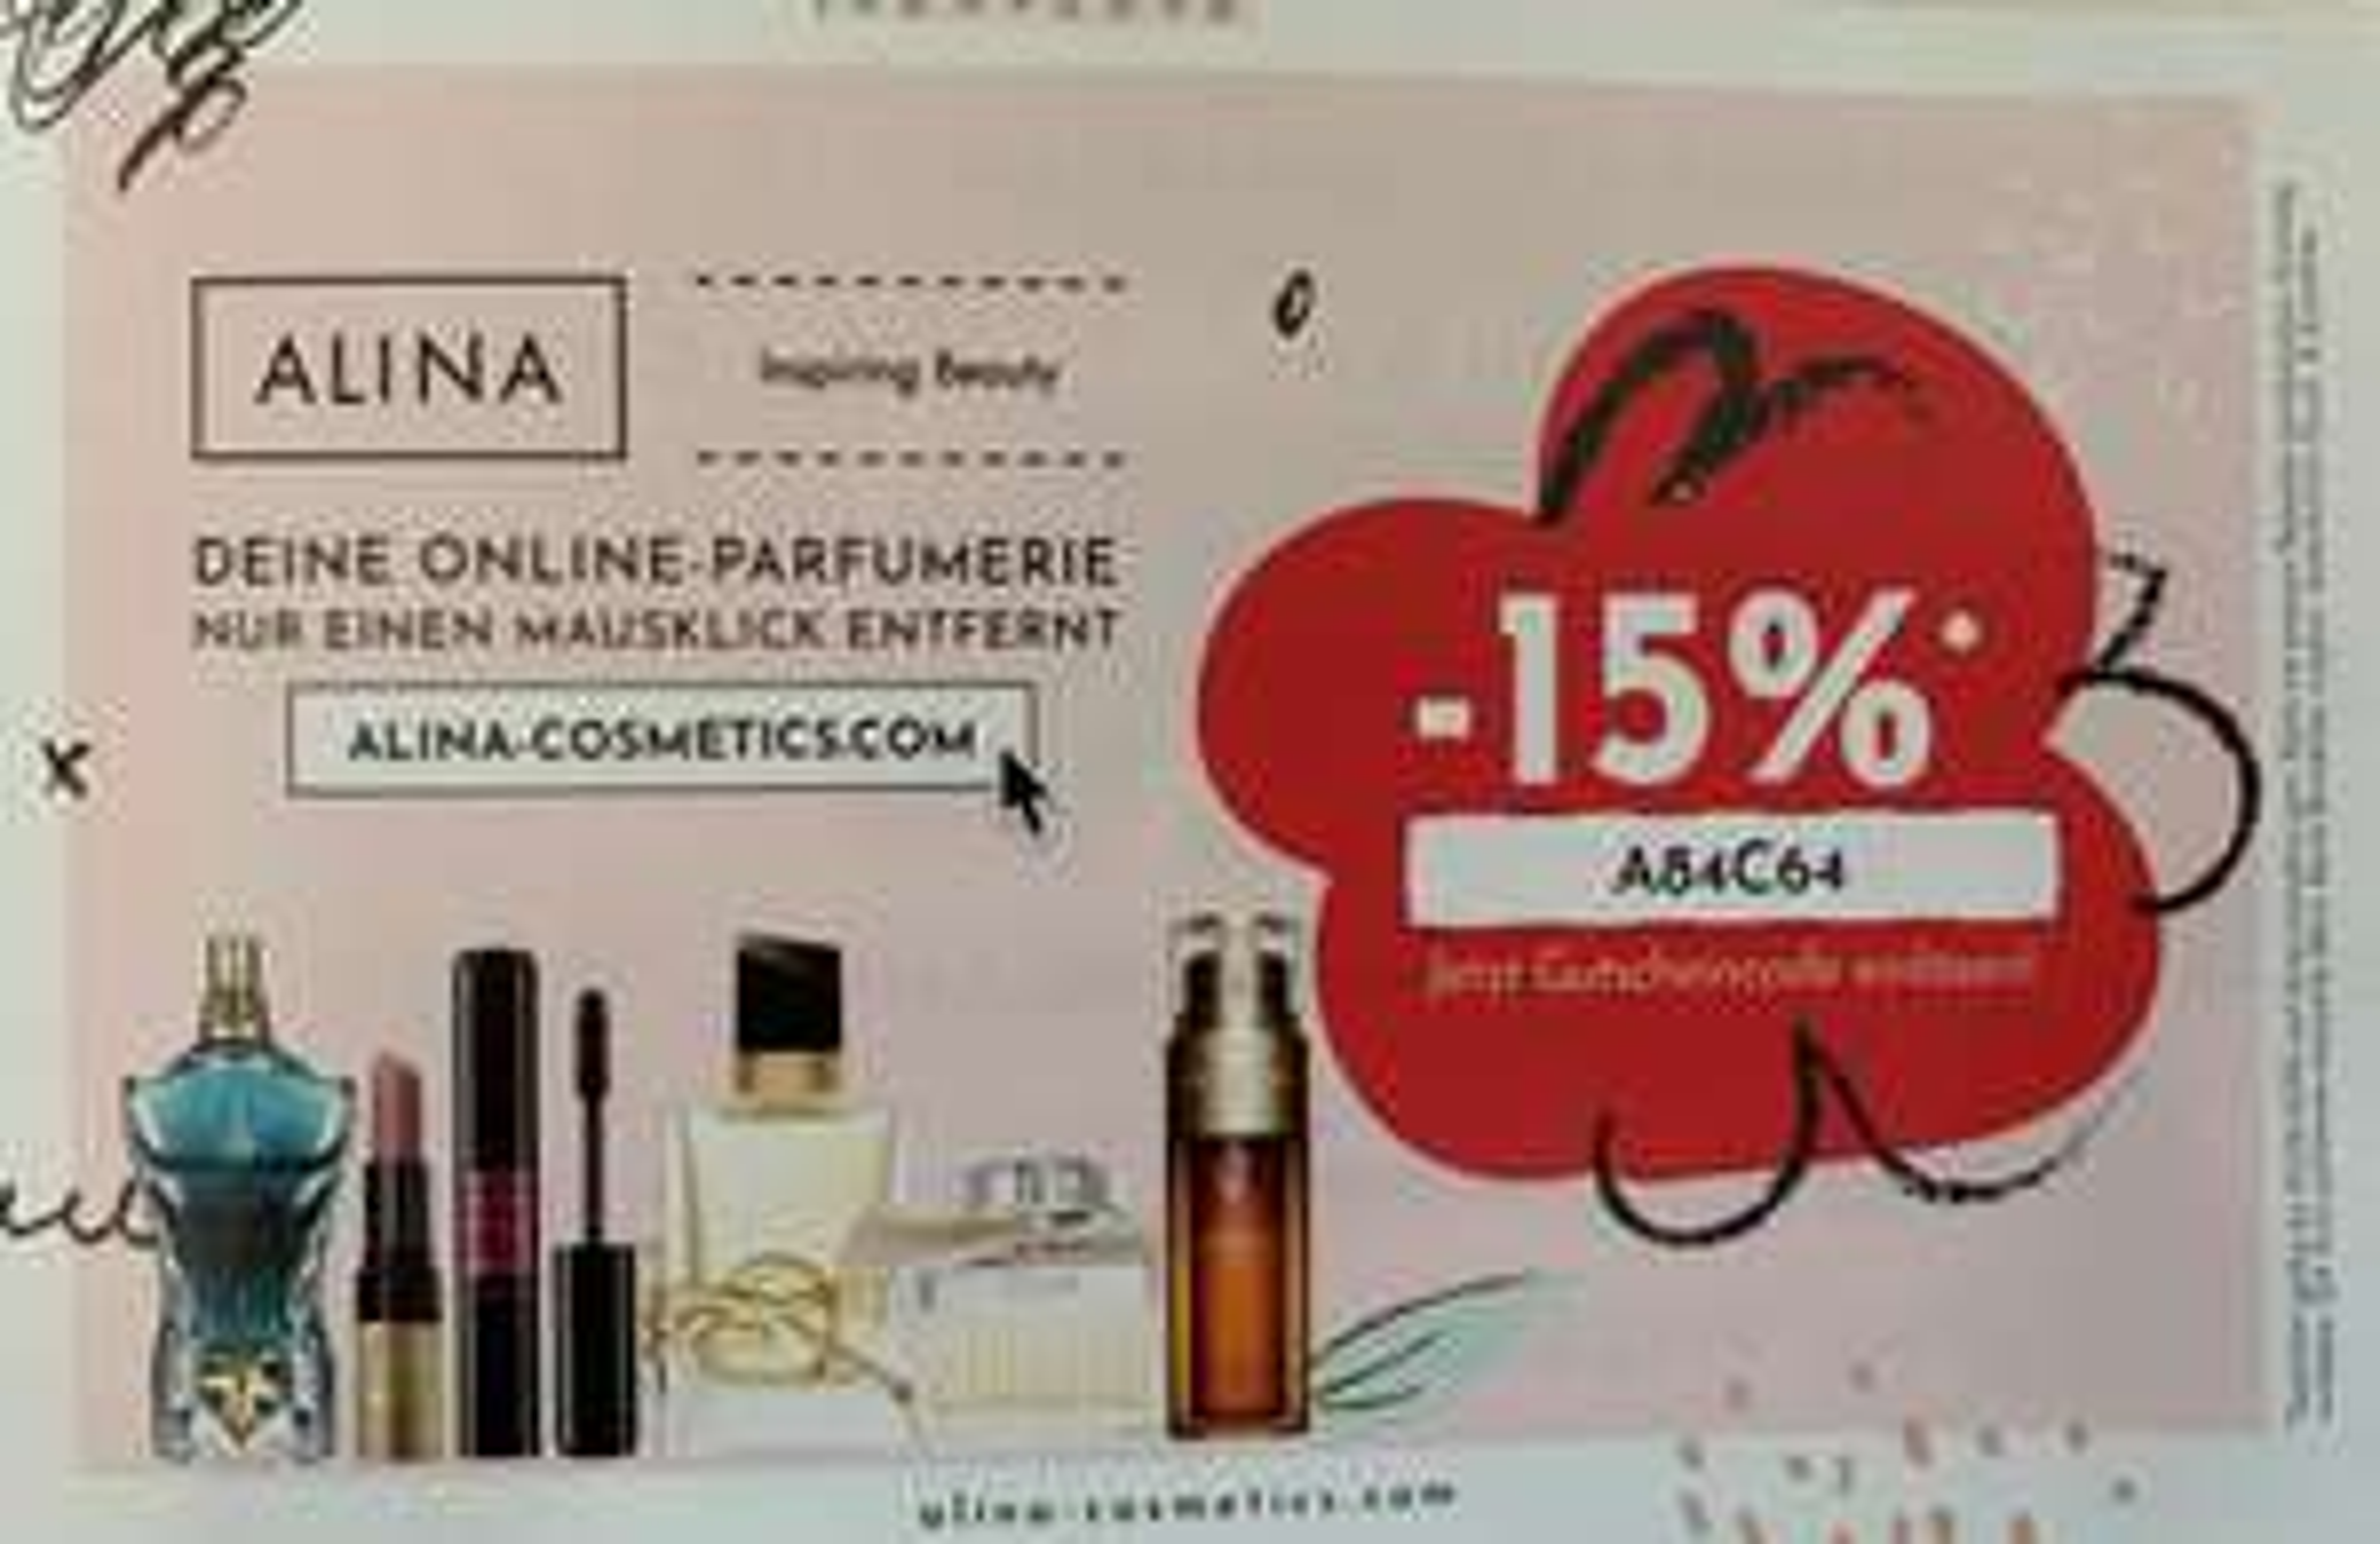 15% Rabatt bei ALINA Cosmetics